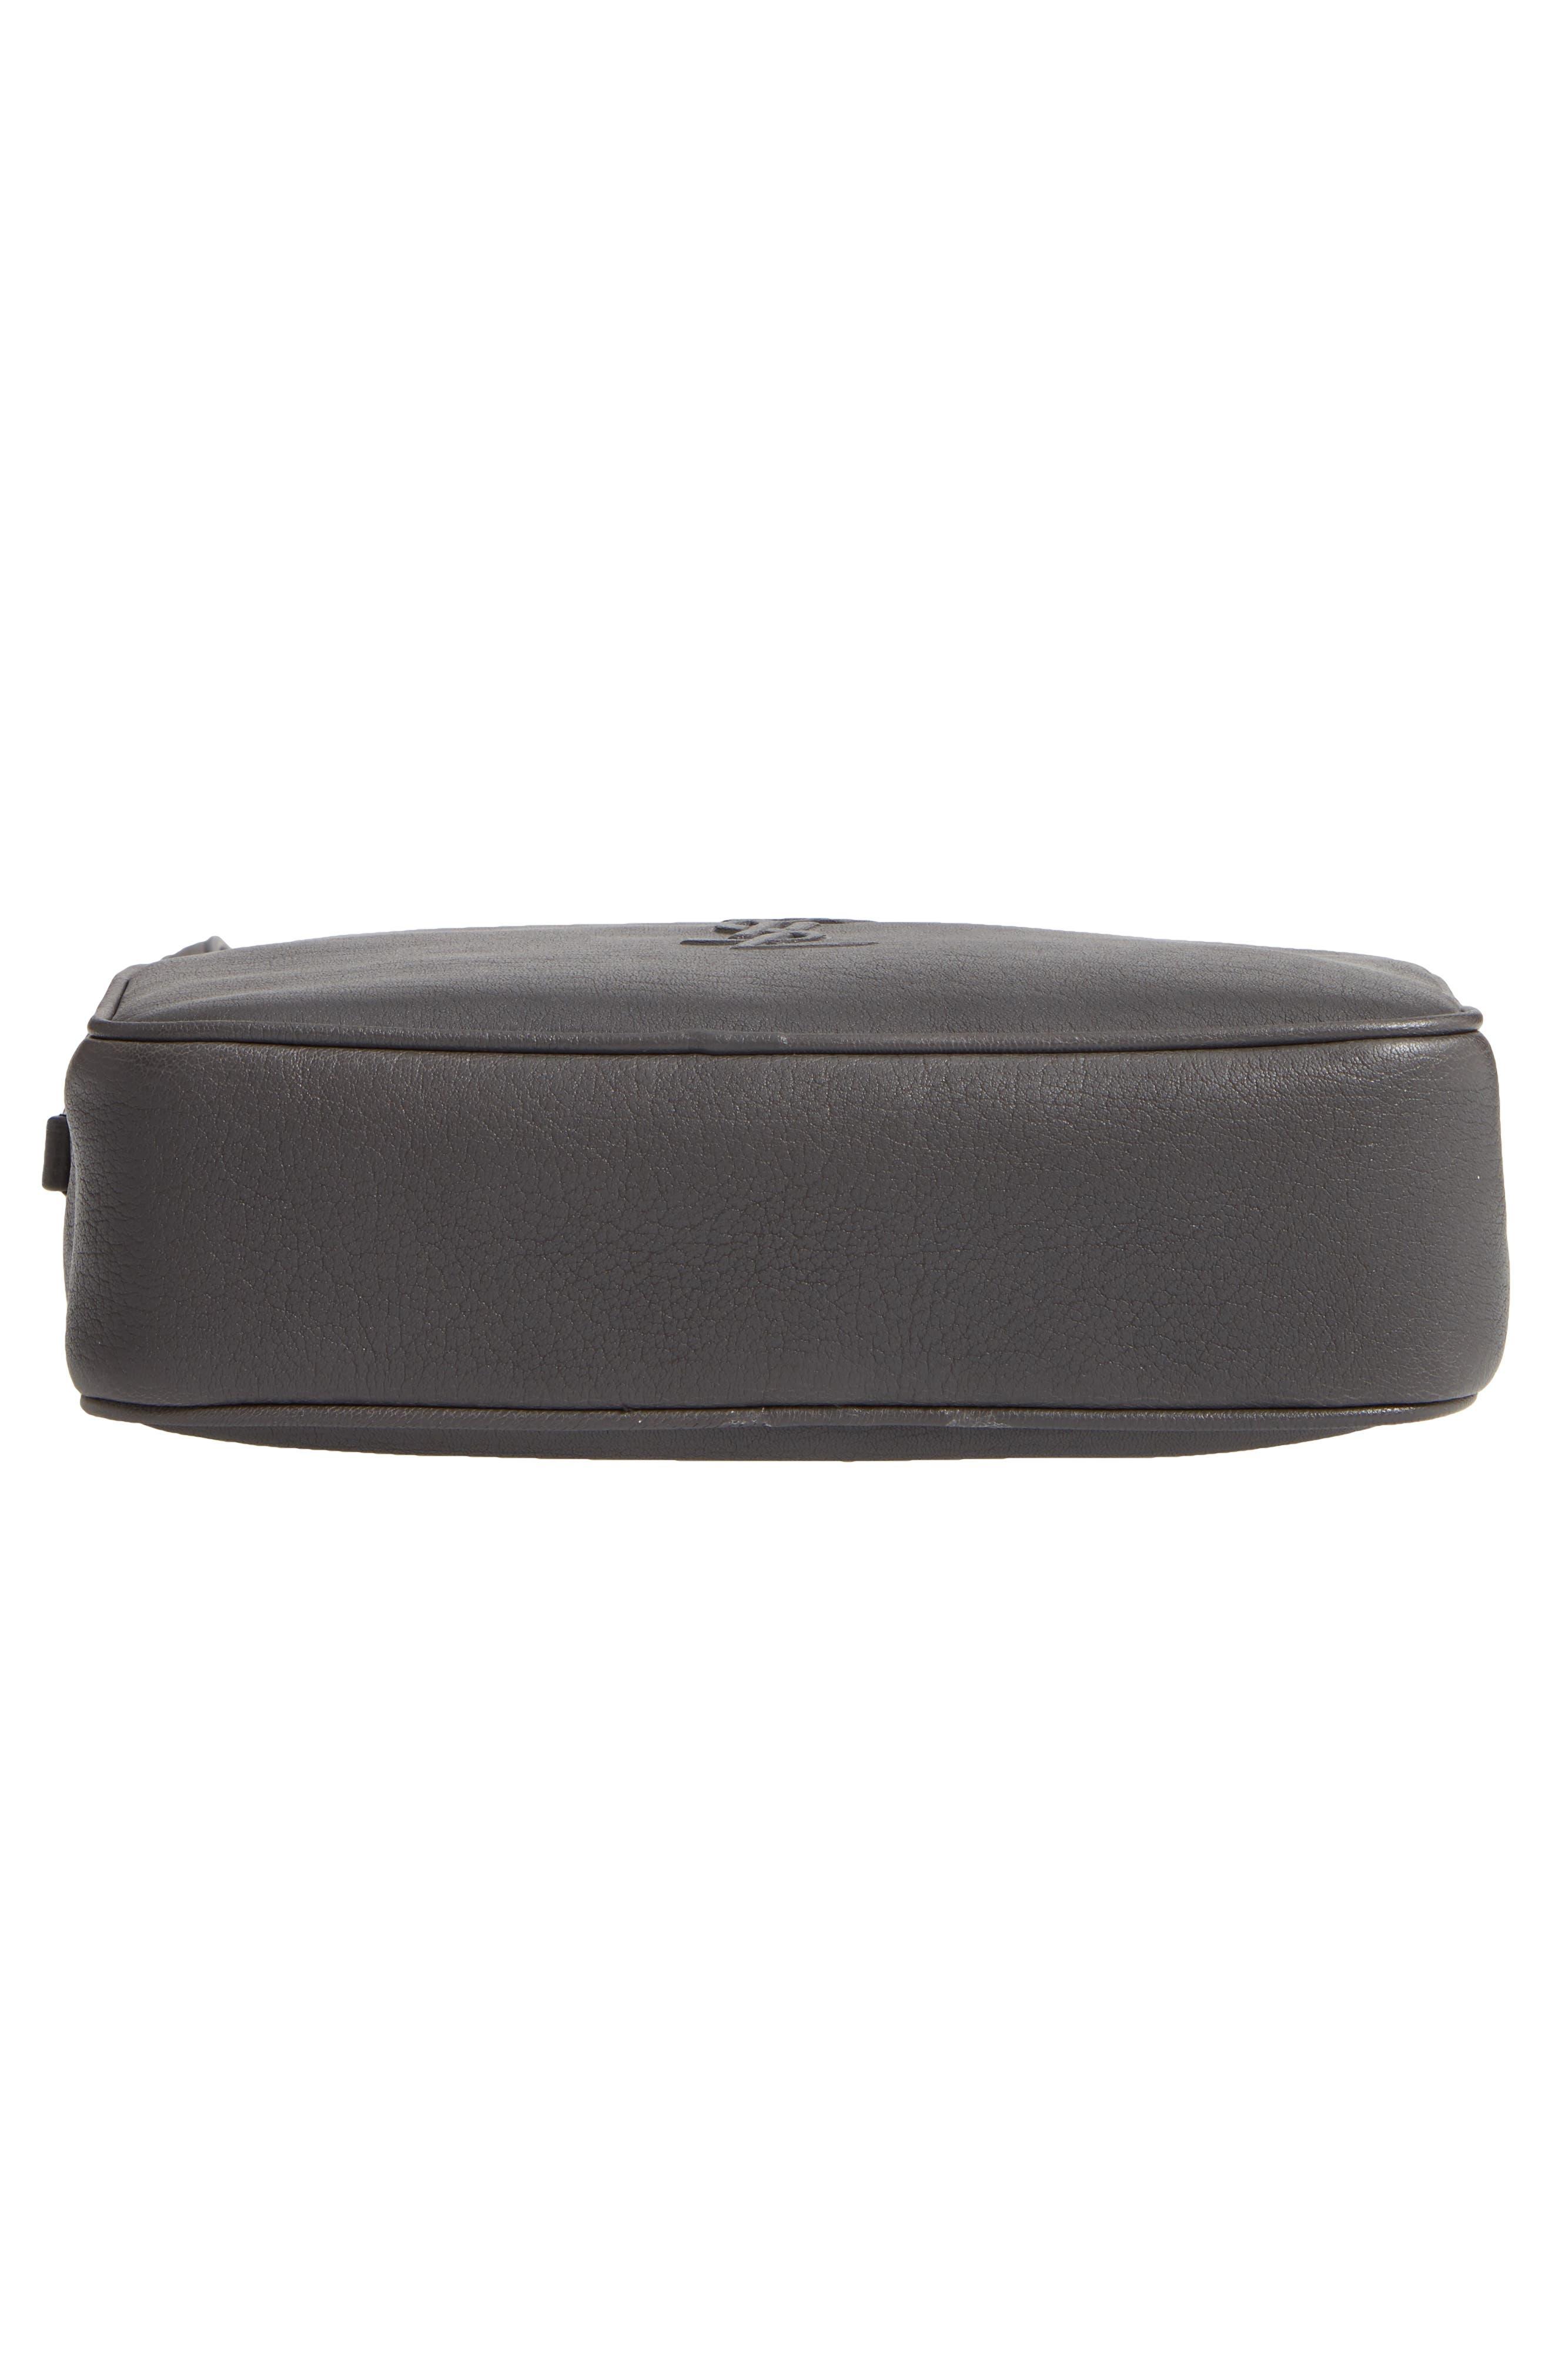 SAINT LAURENT, Small Mono Leather Camera Bag, Alternate thumbnail 6, color, STORM